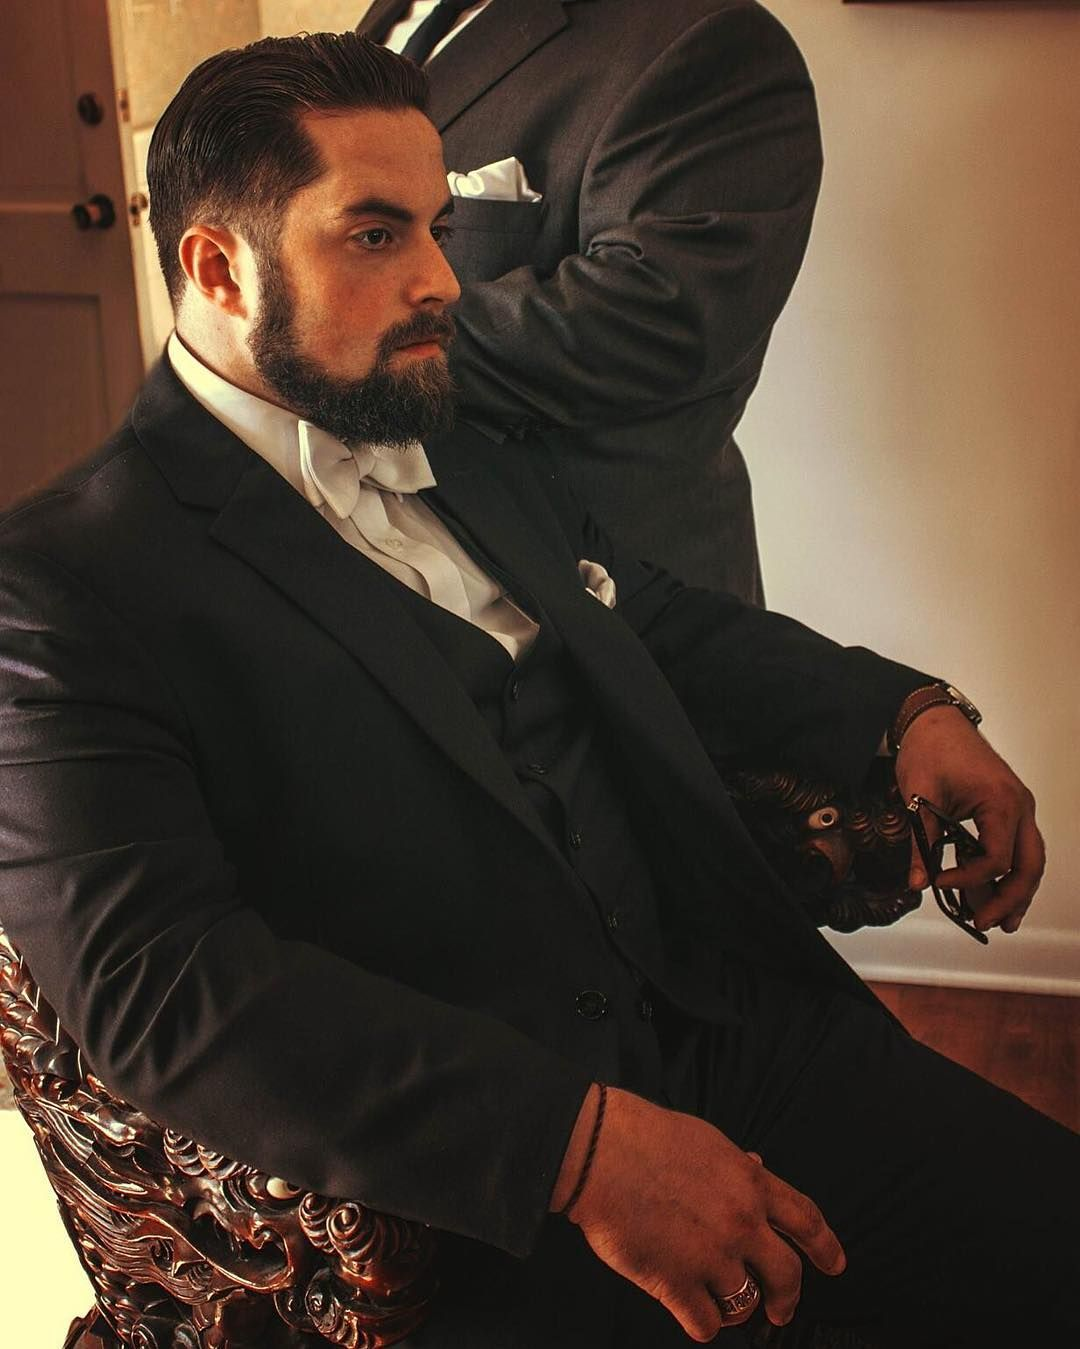 Wedding Beard Styles: #godfather #classy #family #wedding #gentleman #gentlemen